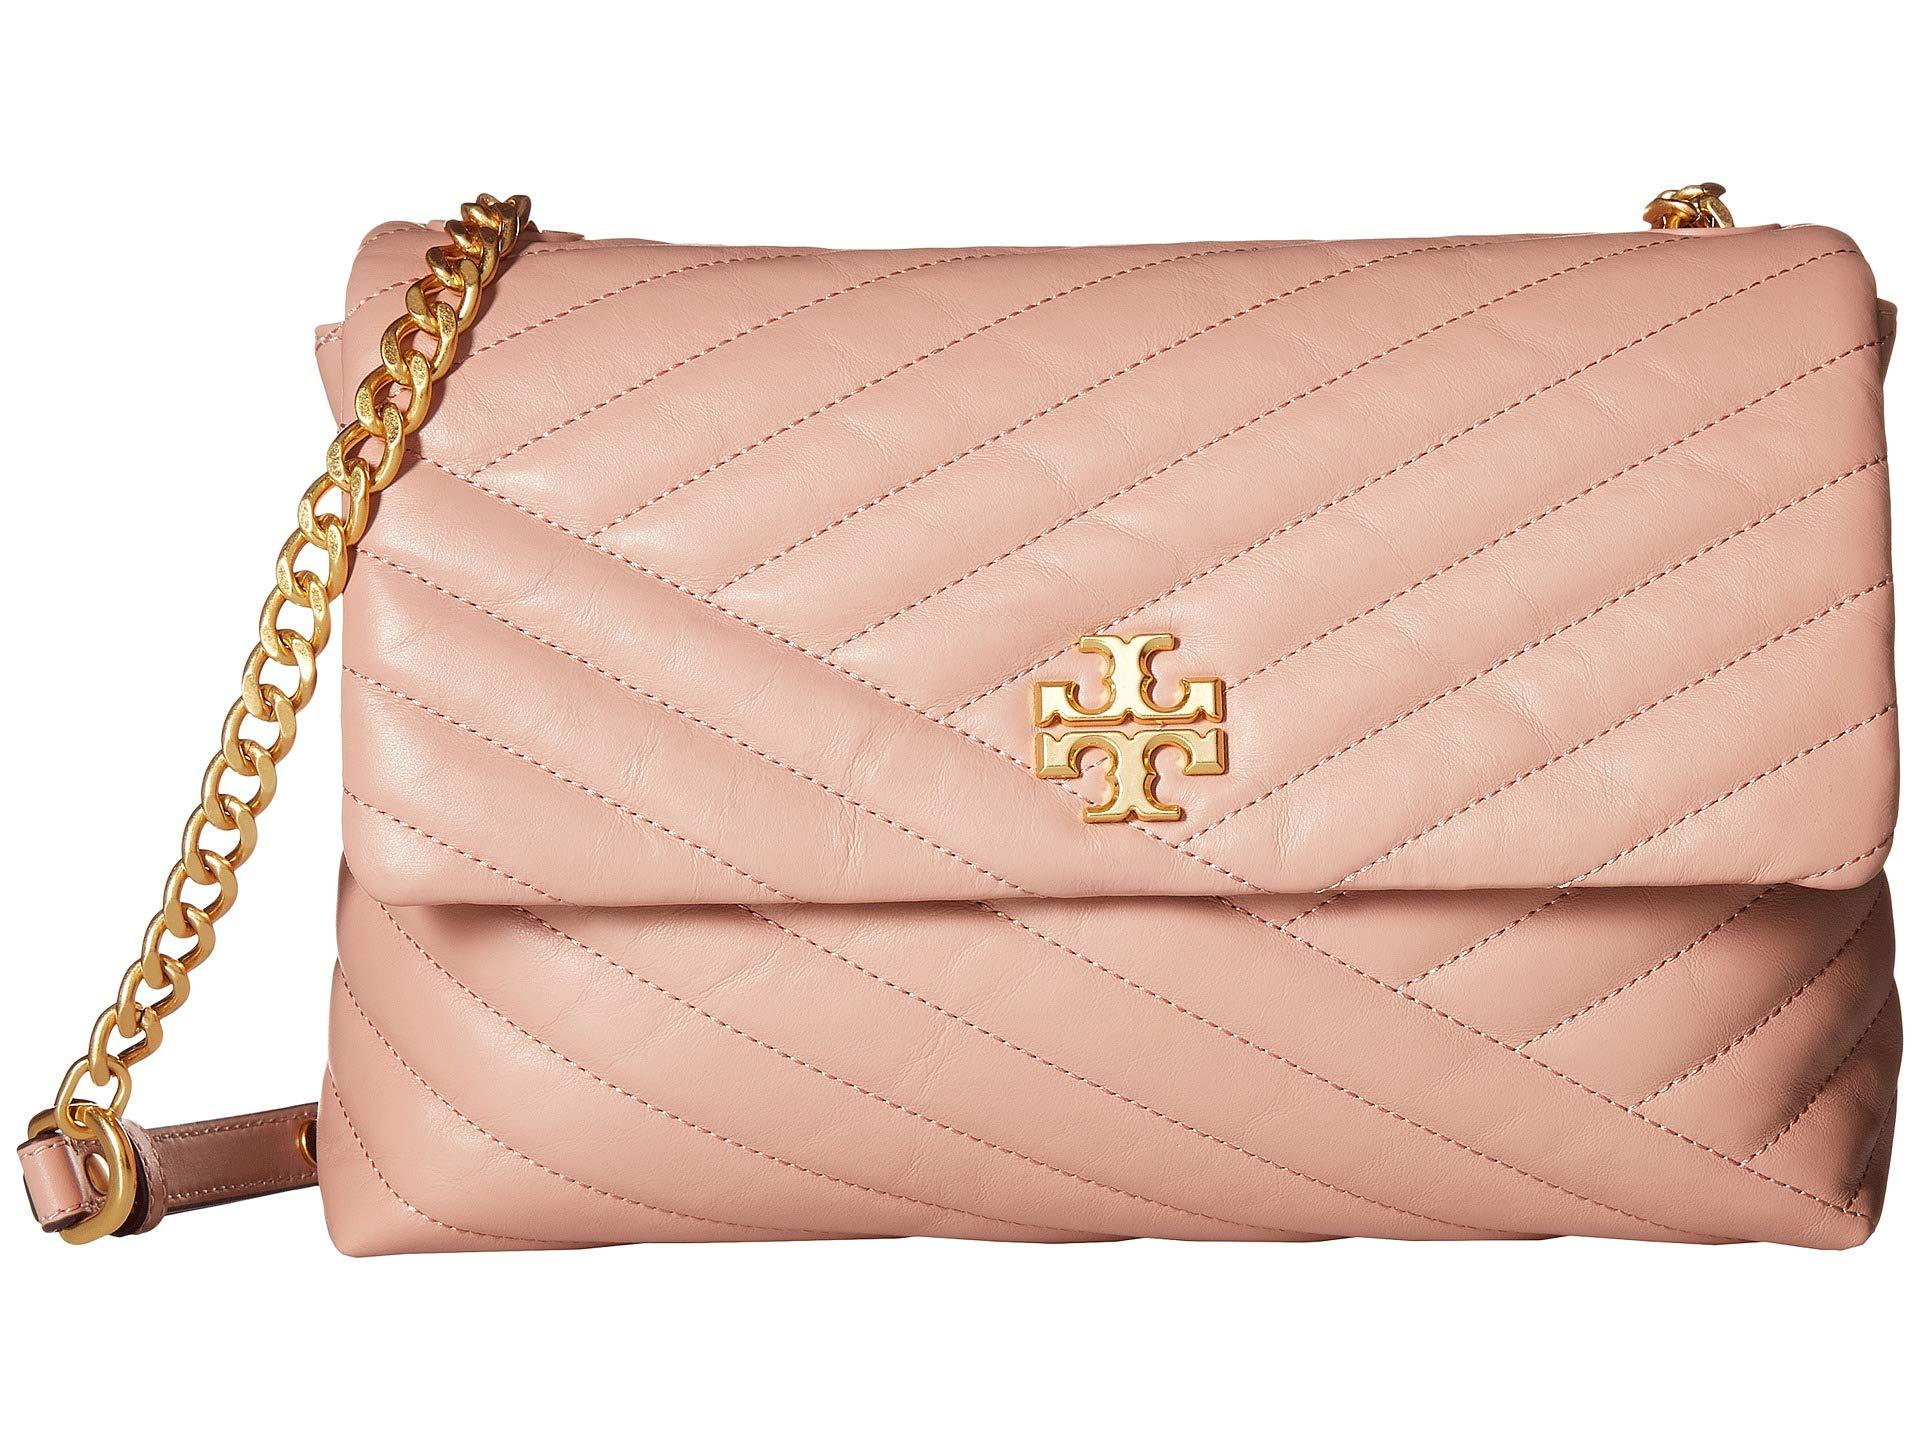 a6790edef Tory Burch. Women s Pink Kira Chevron Flap Shoulder Bag (new Ivory) Handbags